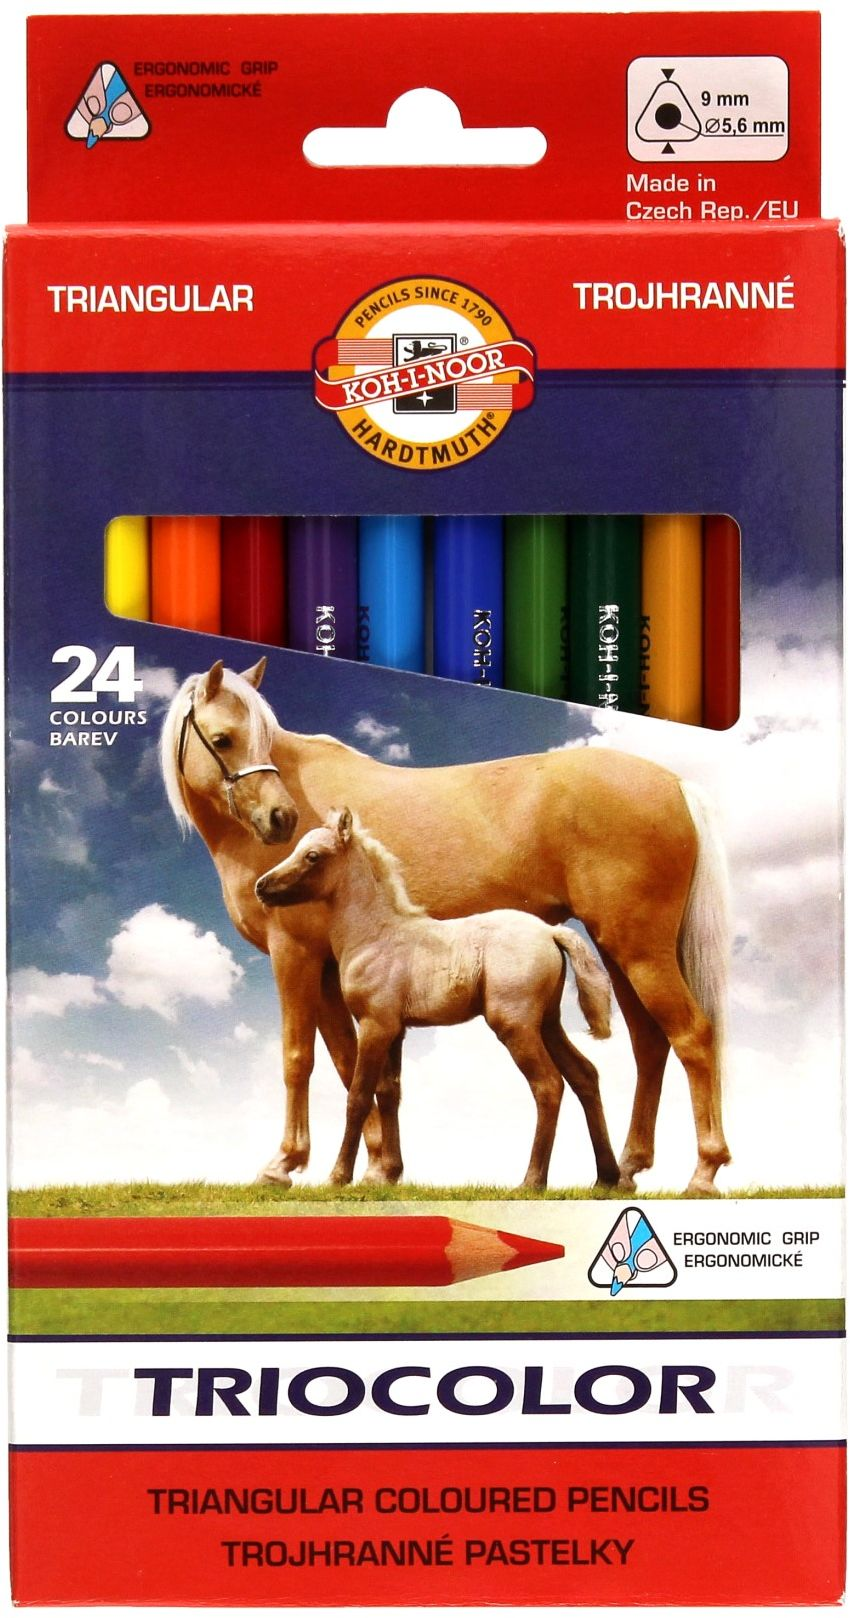 Kredki ołówkowe trójkątne 24kol 9mm Tricolor Koh-I-Noor 3144